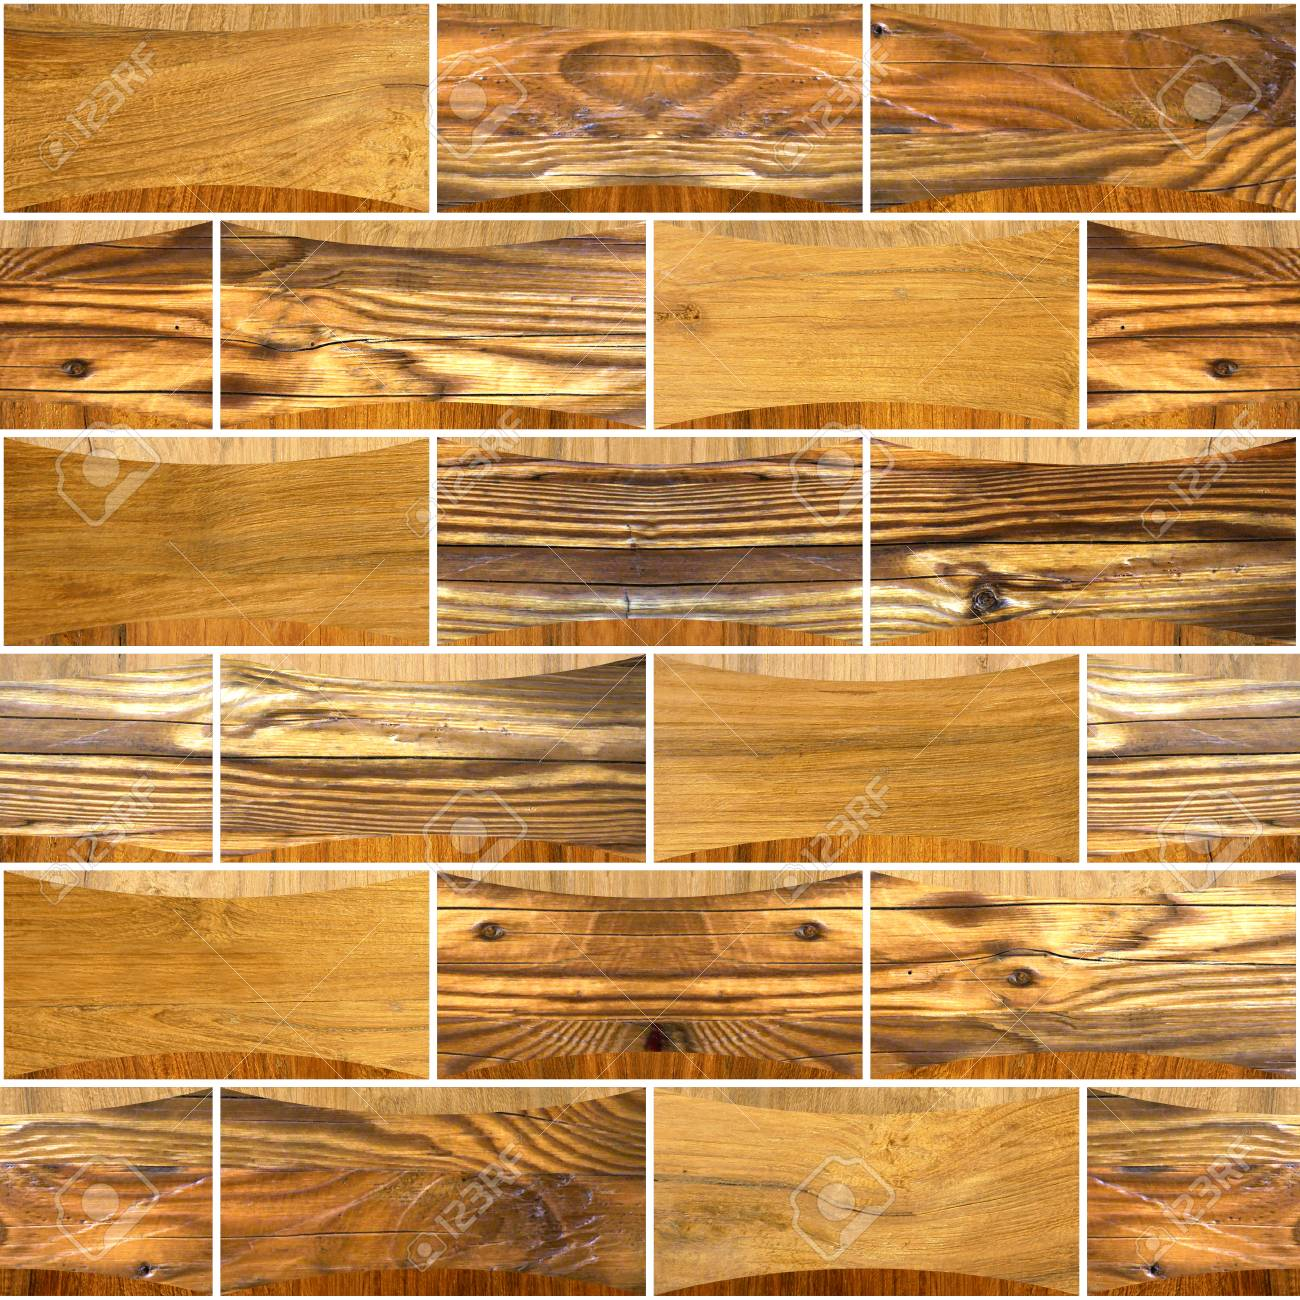 Decorative wooden bricks - Interior wall decoration - Abstract